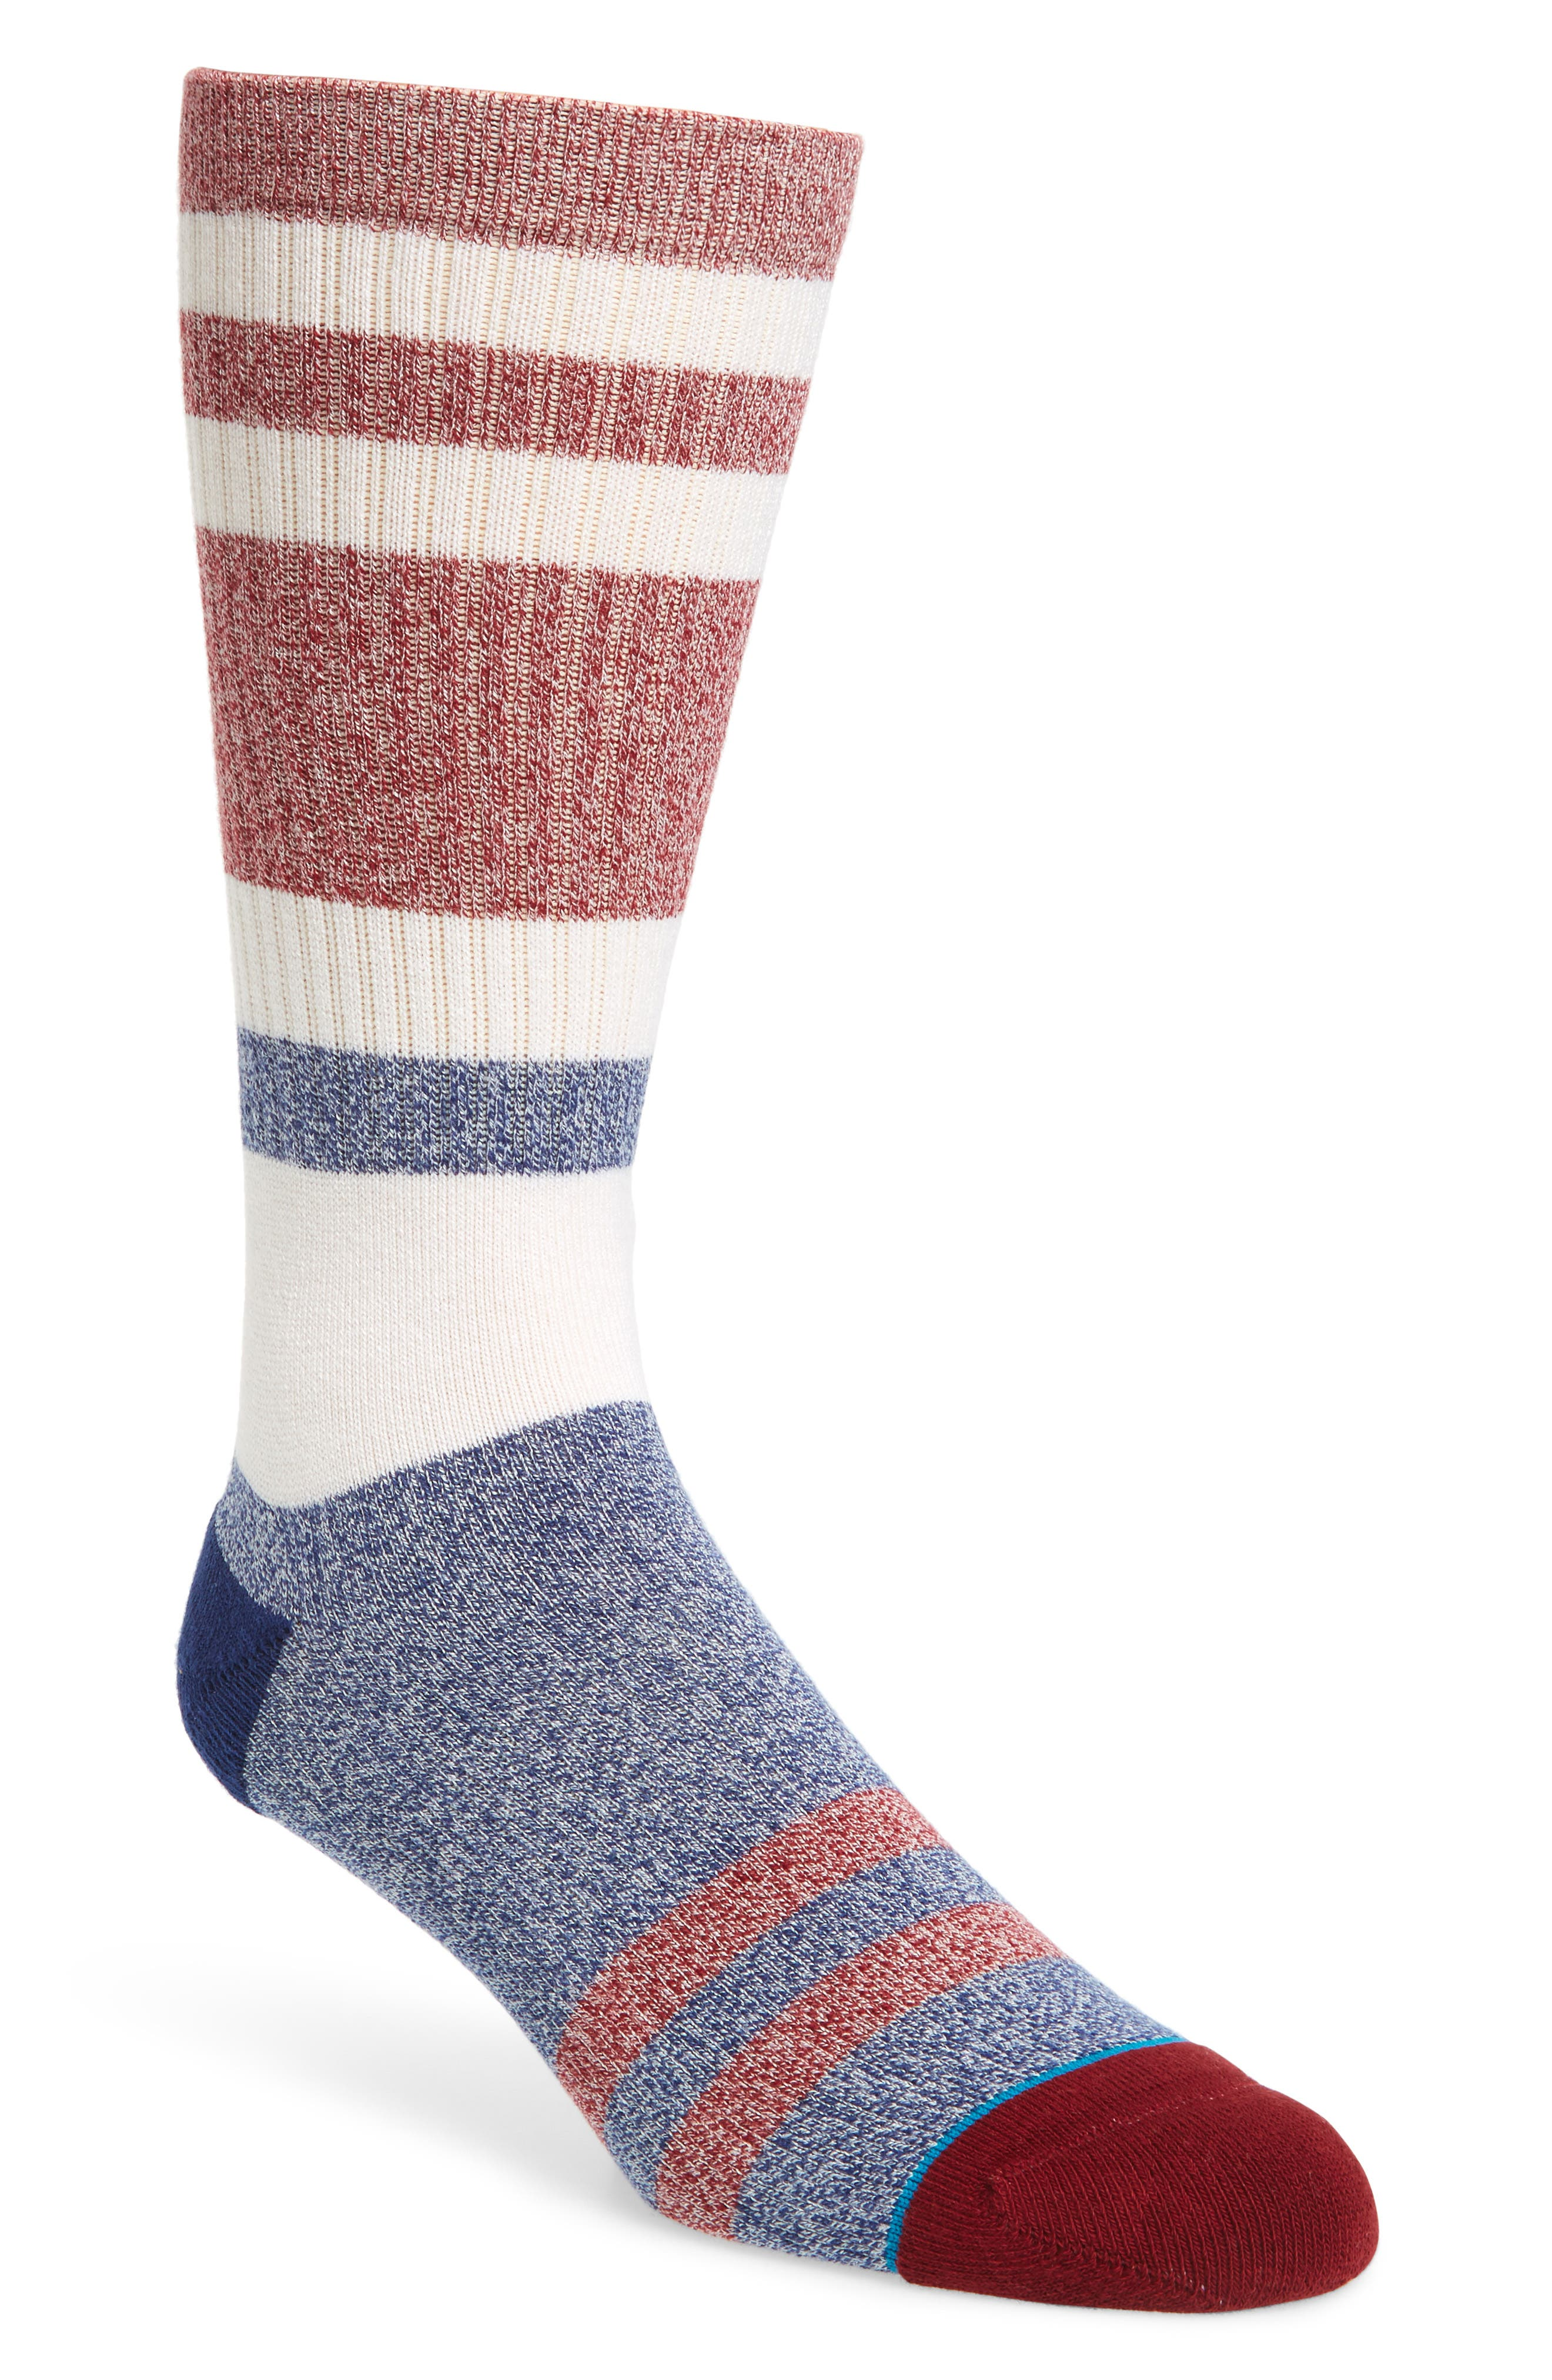 Robinsen Crew Socks,                             Main thumbnail 1, color,                             Red